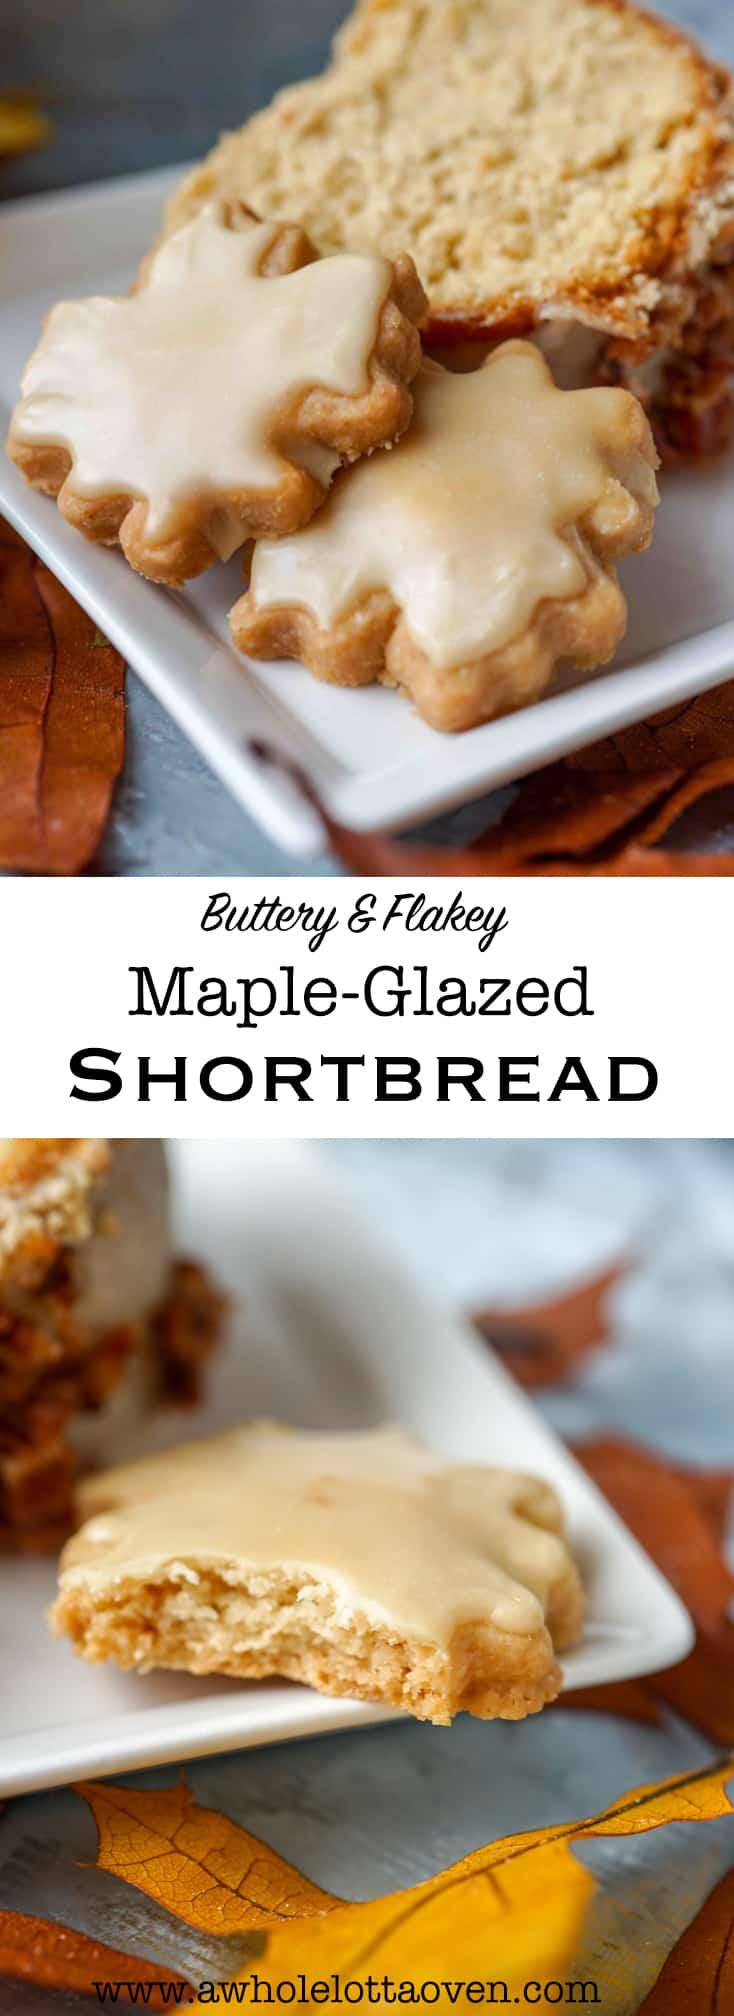 Maple glazed shortbread